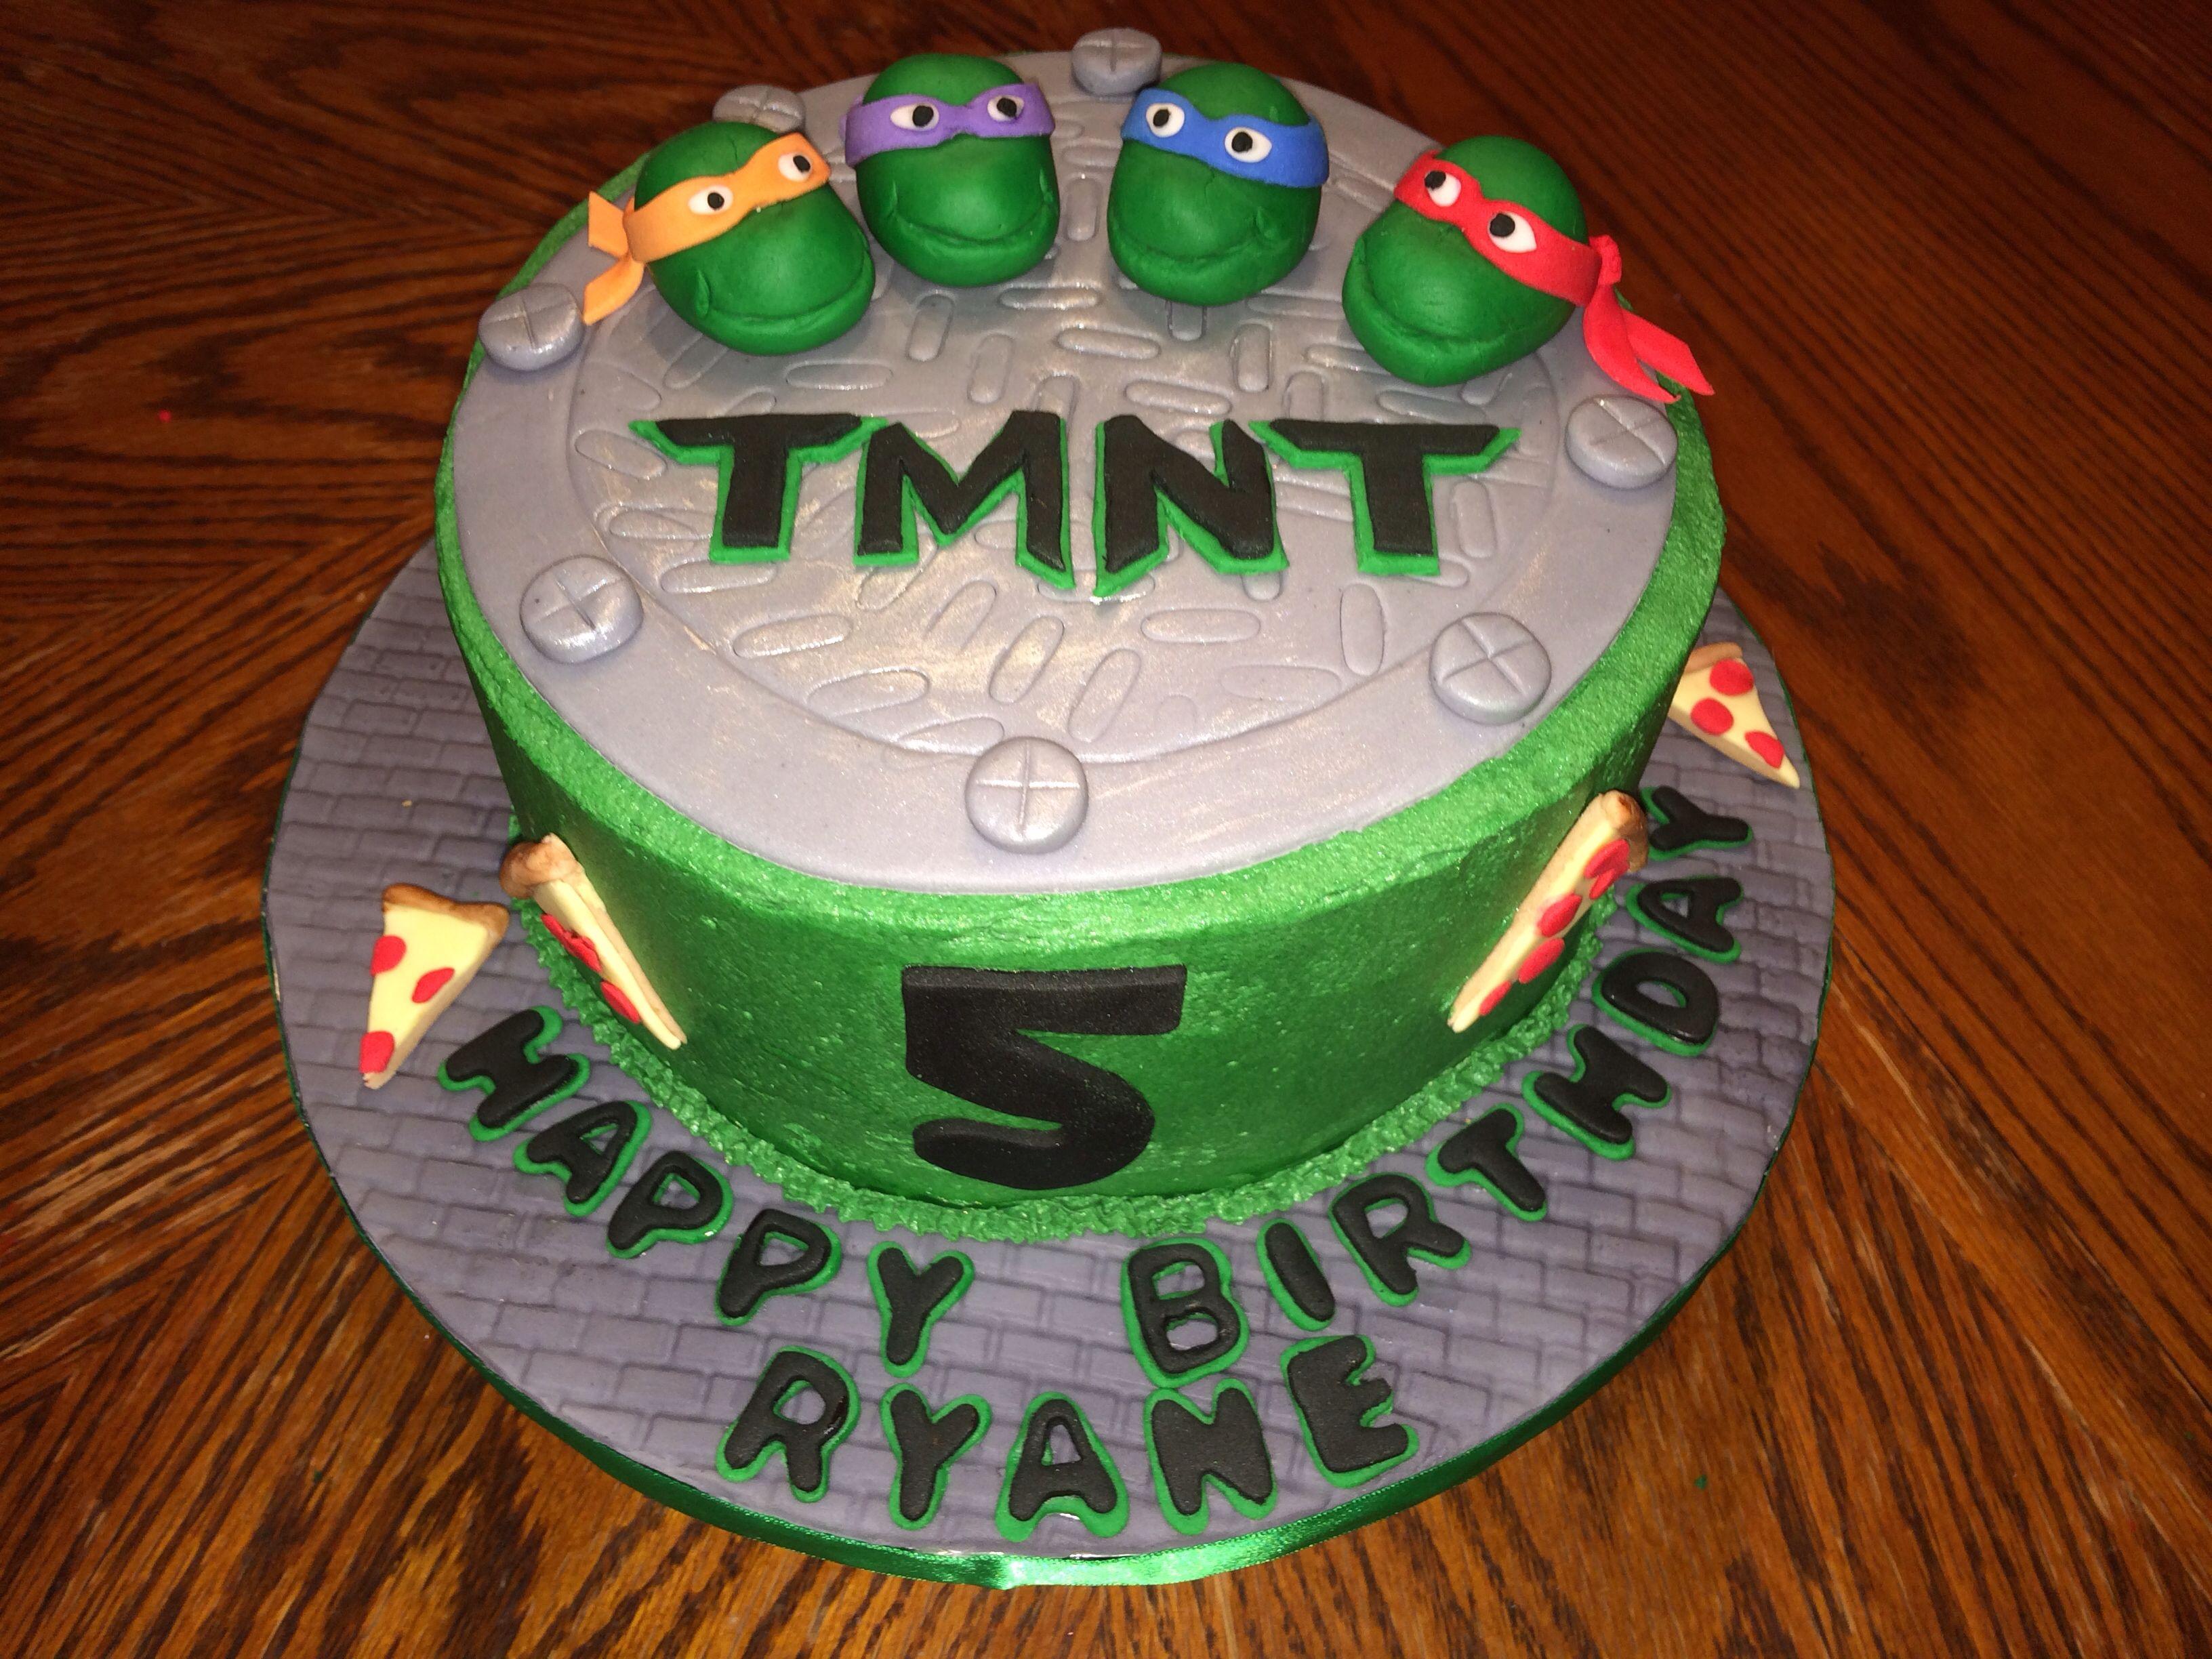 A TMNT cake I made for a friend.